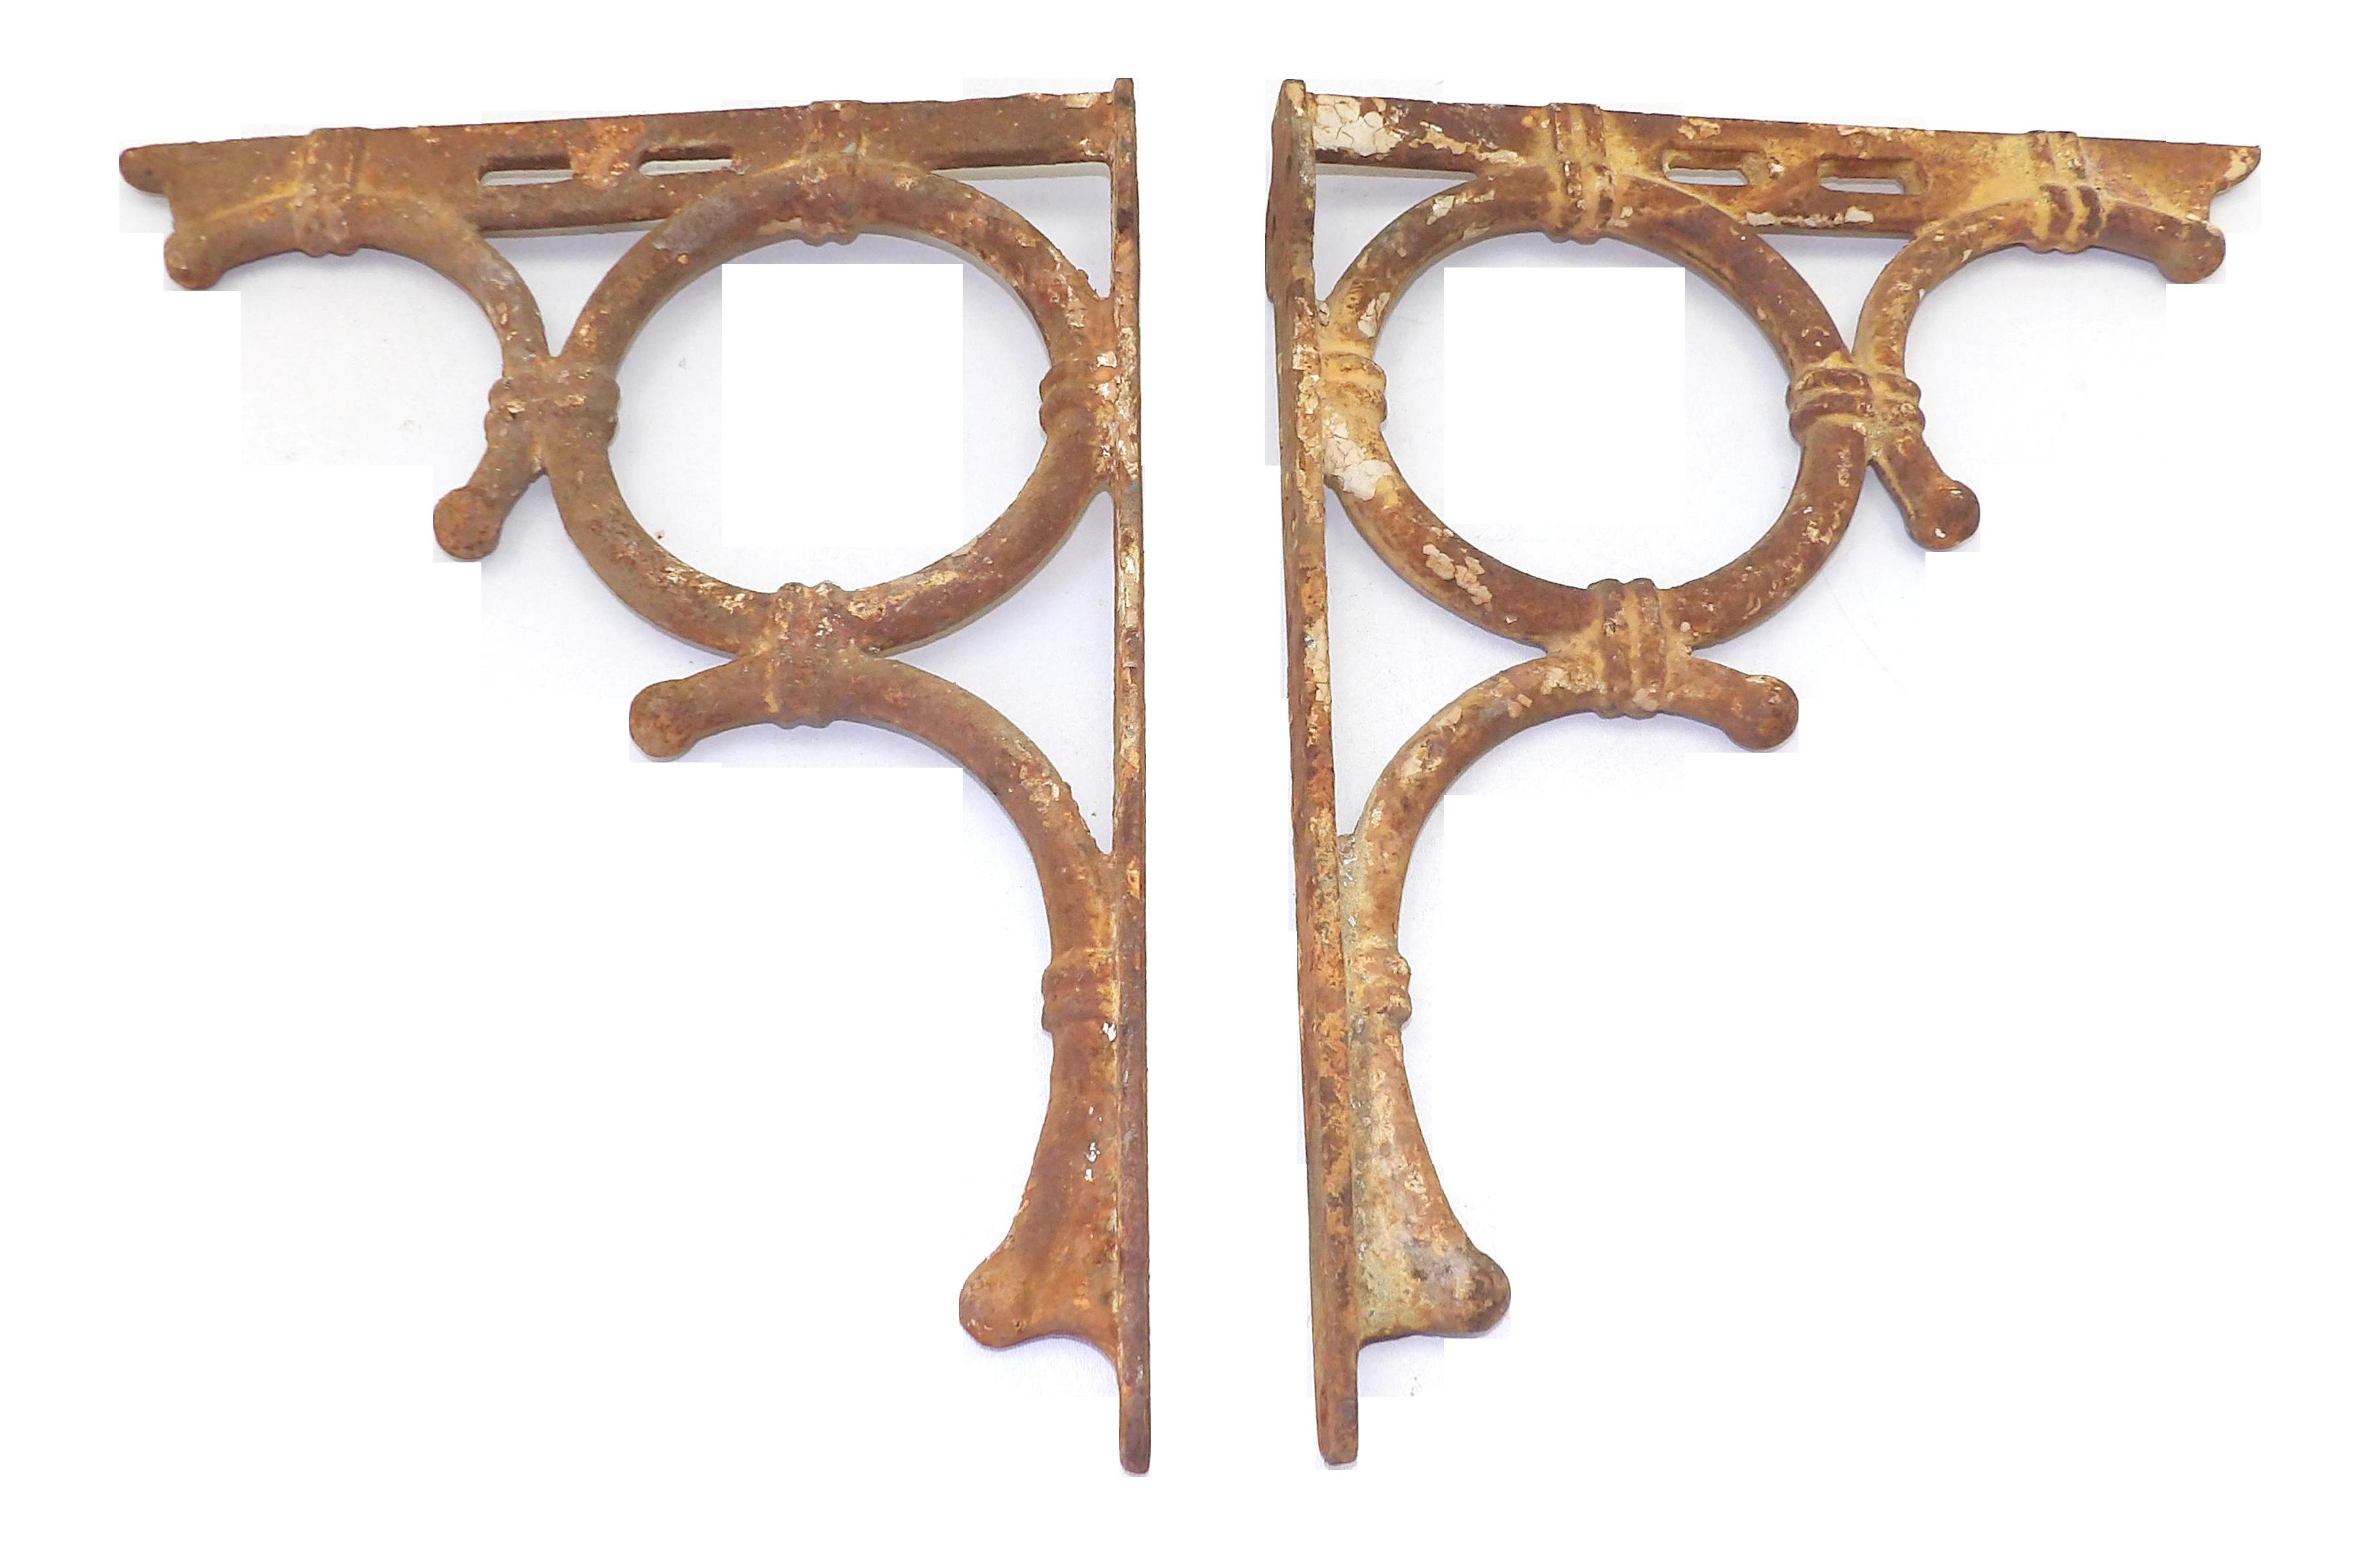 Antique Farmhouse Cast Iron Shelf Brackets A Pair